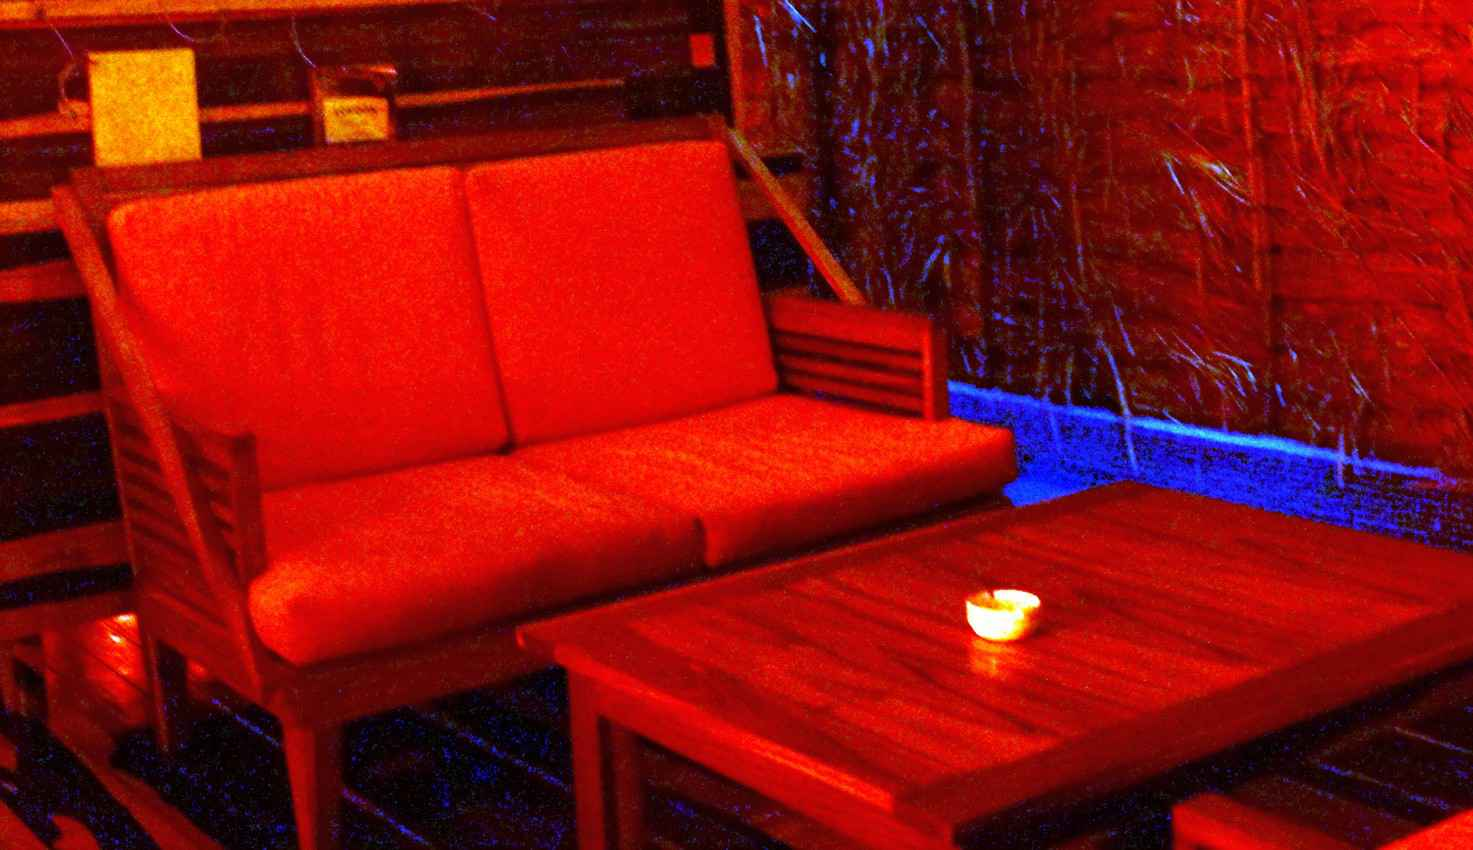 A dimly lit red room in a local Playa Del Carmen bar.